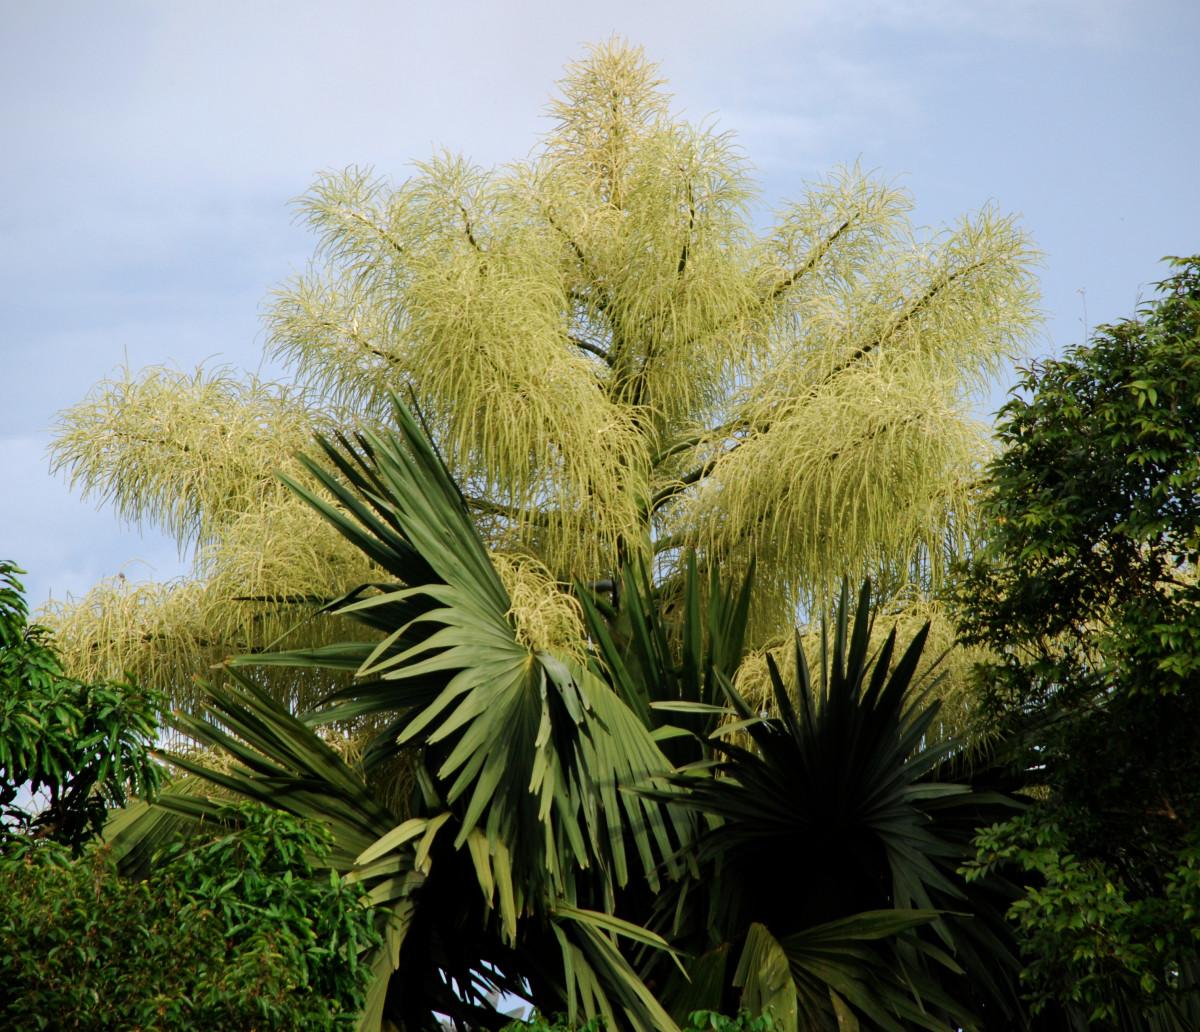 Elegant Palms as Perennial Icons of the Garden